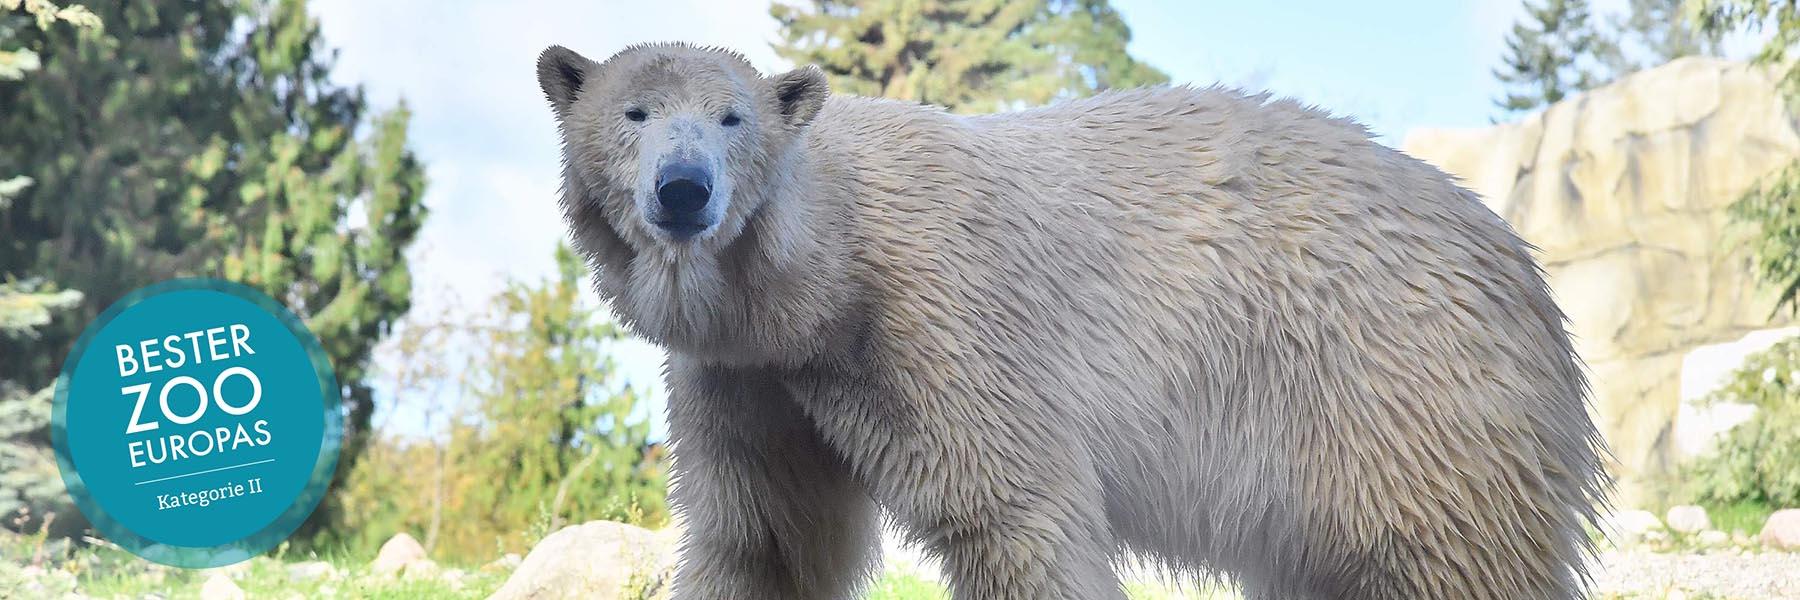 Eisbär - Zoologischer Garten Rostock